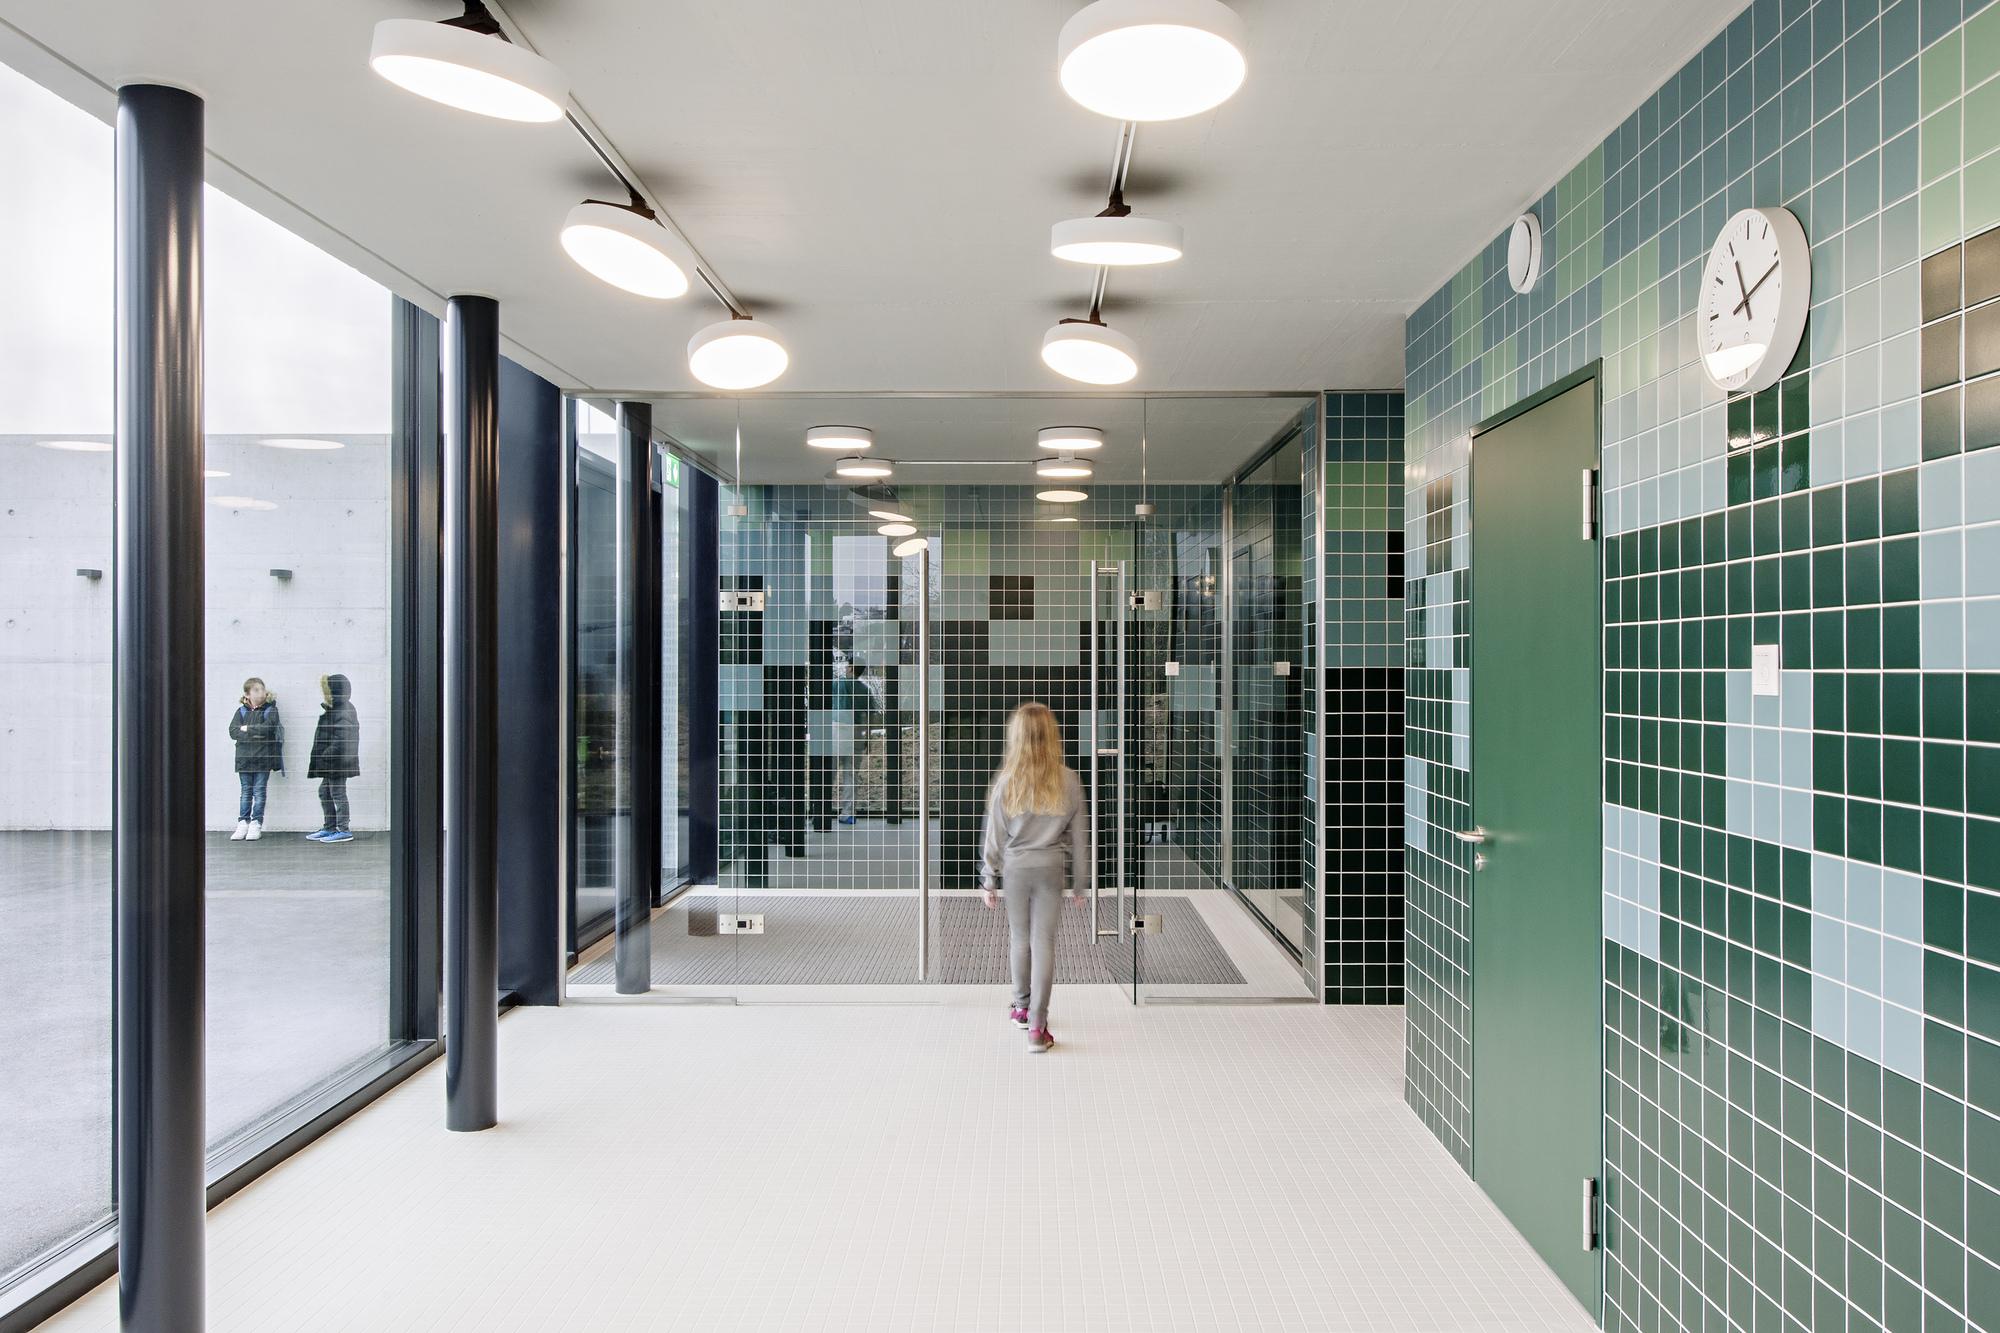 Gallery of swimming pool allmendli illiz architektur 13 - Schwimmbad architektur ...